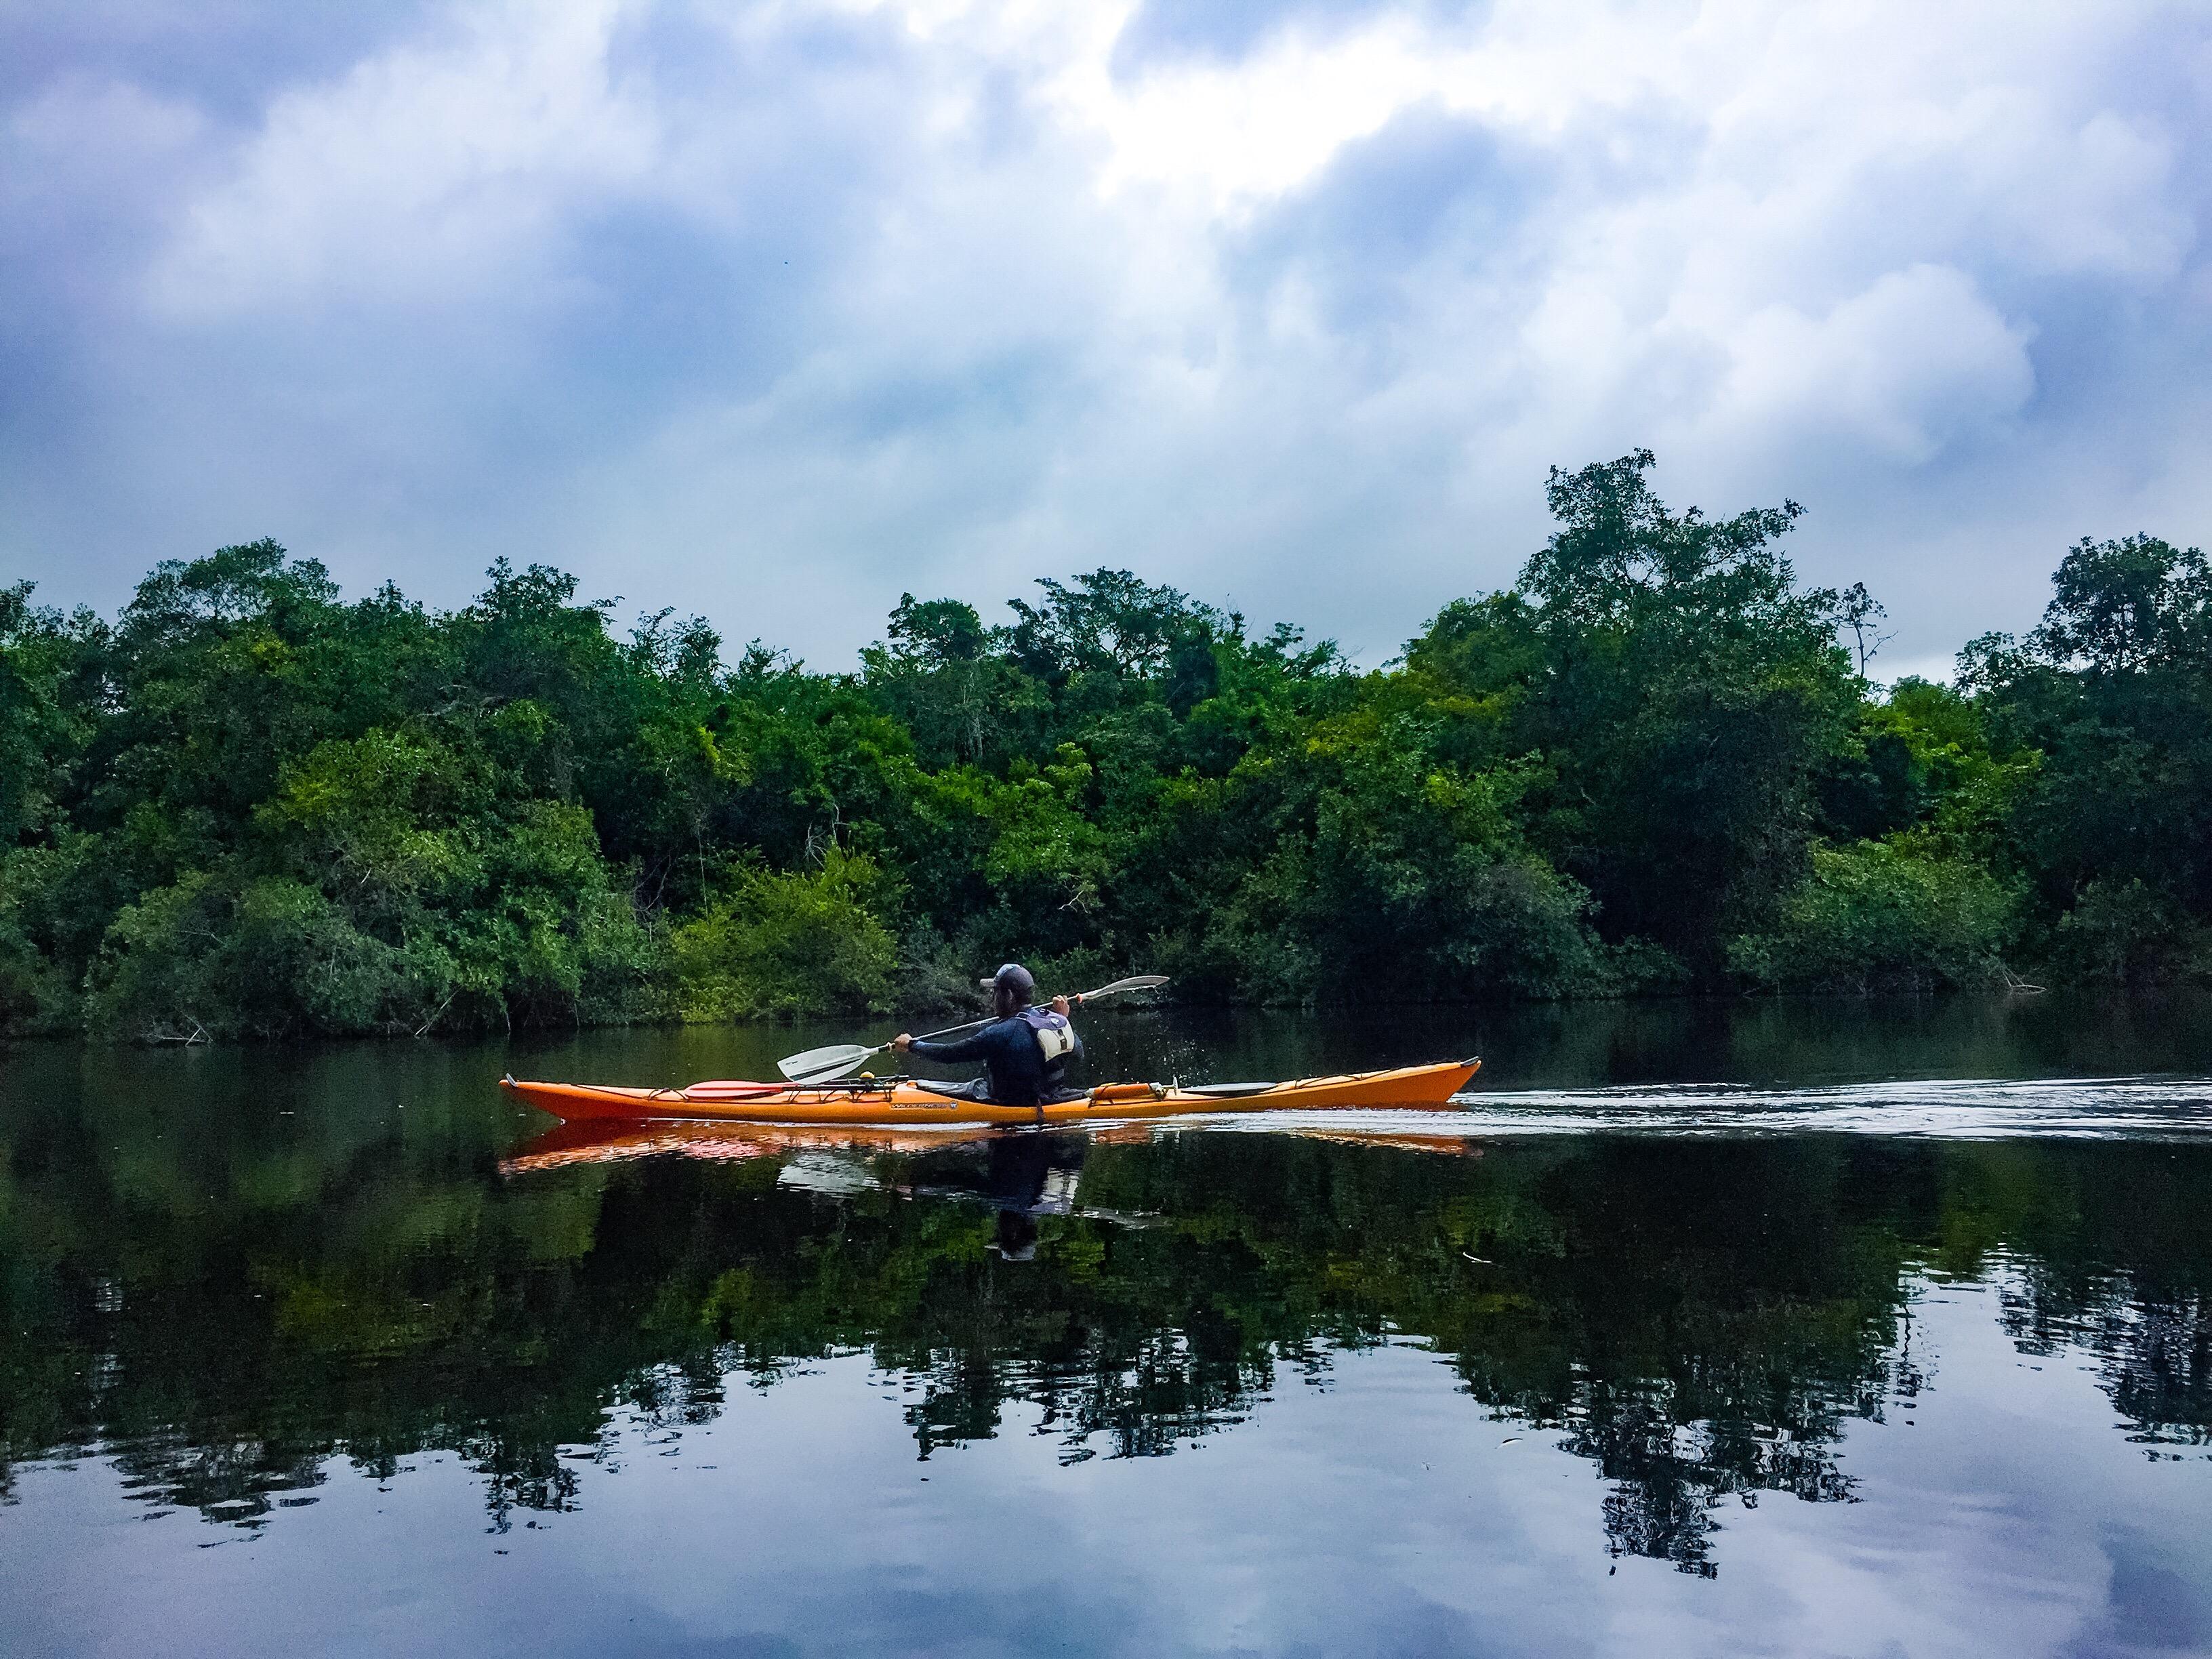 outdoor-jungle-and-kayak-rio-hondo-blue-creek-border-between-mexico-and-belize-2017_t20_vKgkVj (2)